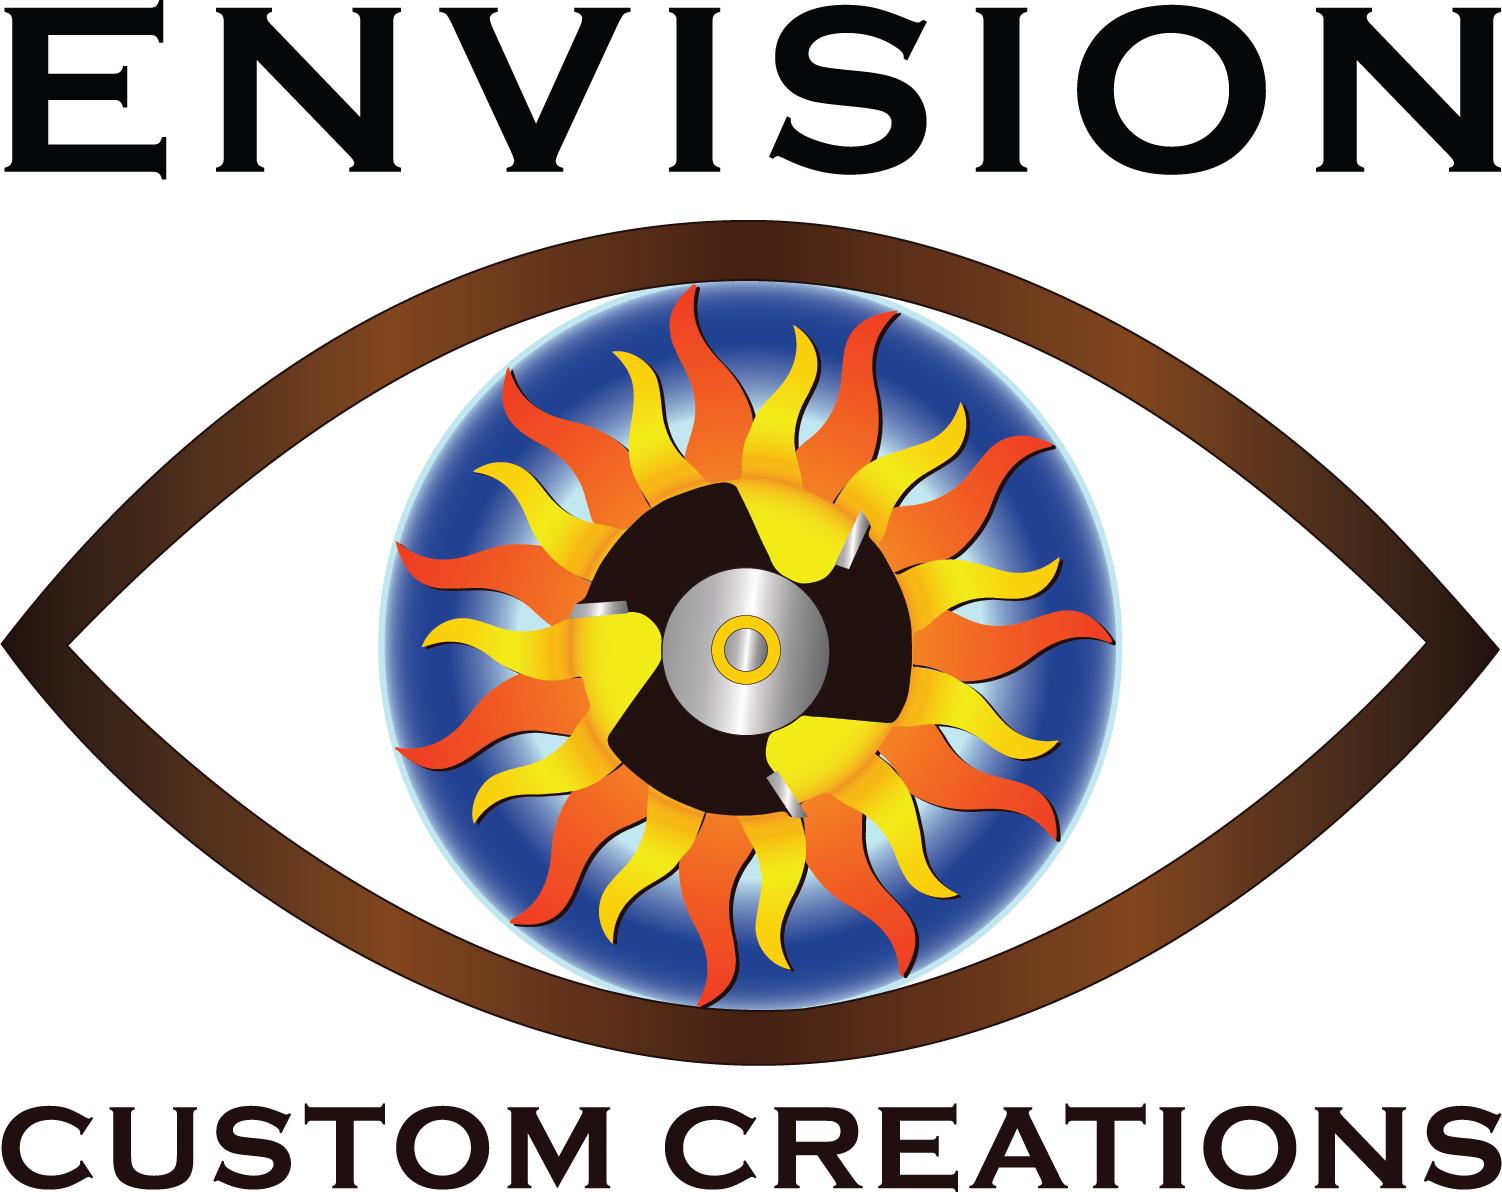 Envision Custom Creations